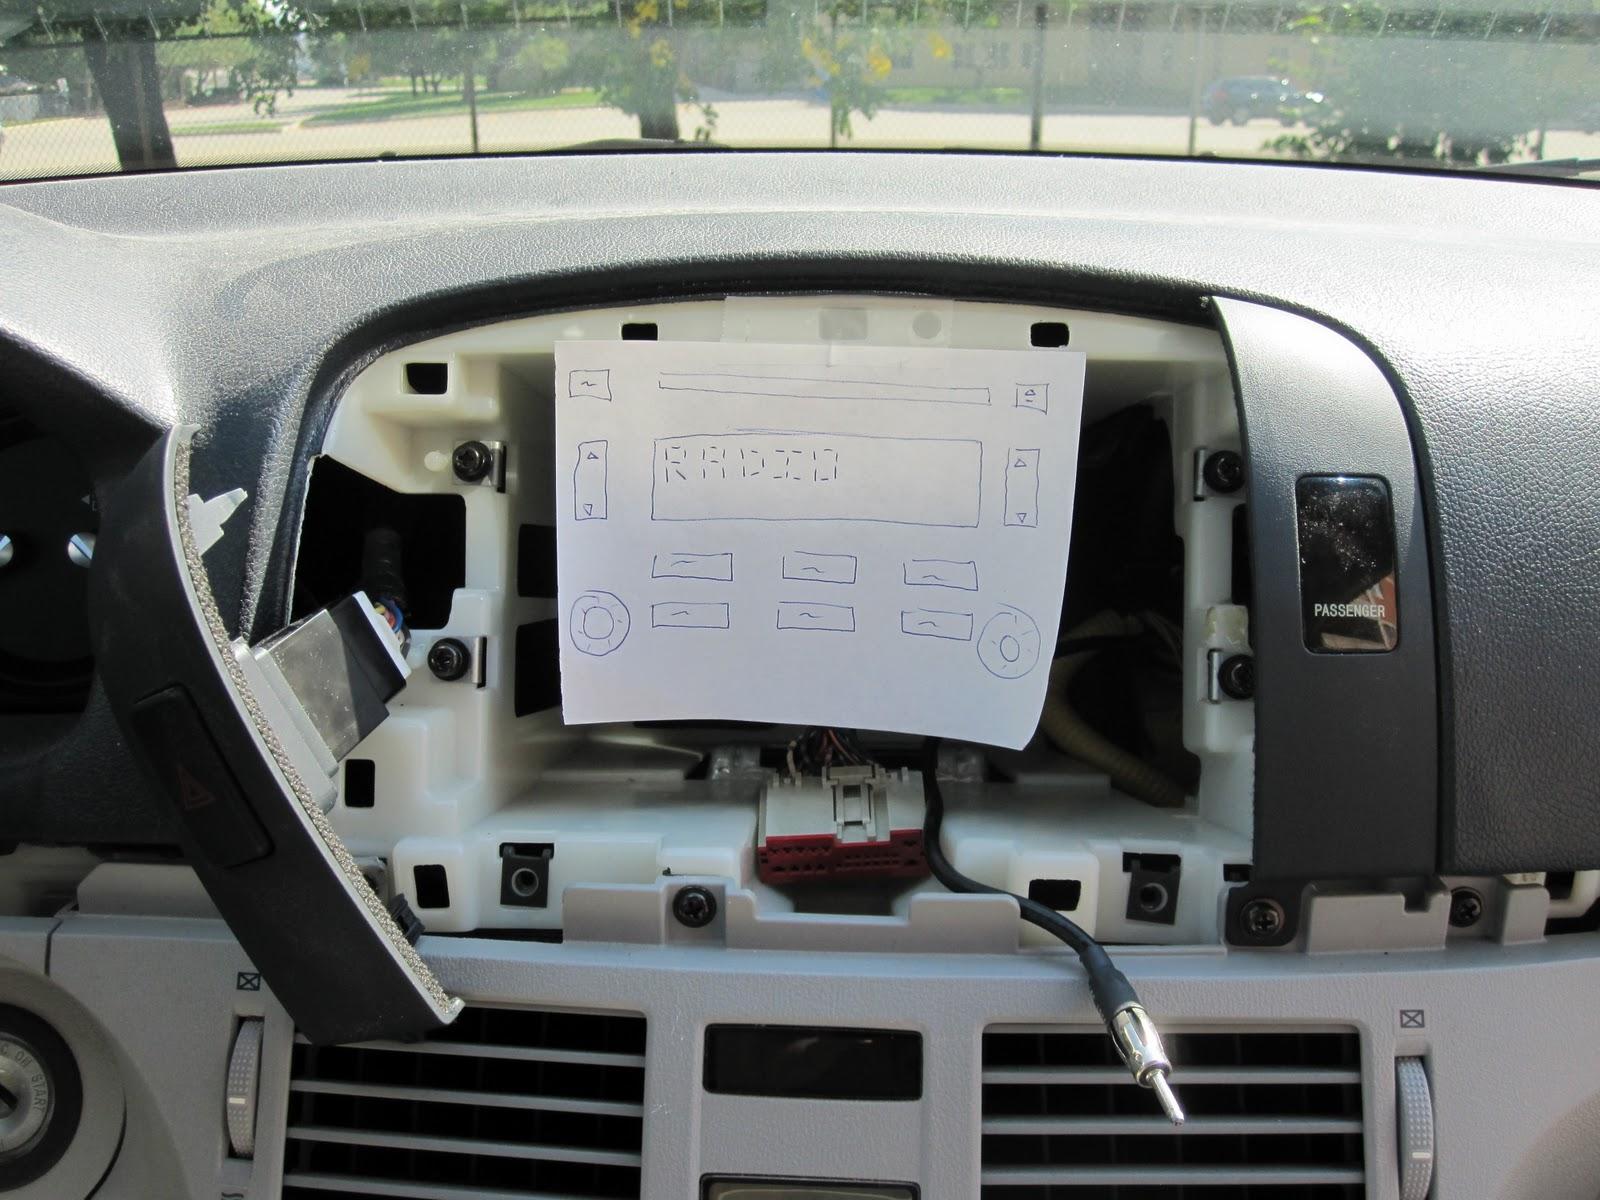 medium resolution of lighter wiring diagram 2006 hyundai azera introduction to 2007 hyundai vera cruz 2007 hyundai azera speaker